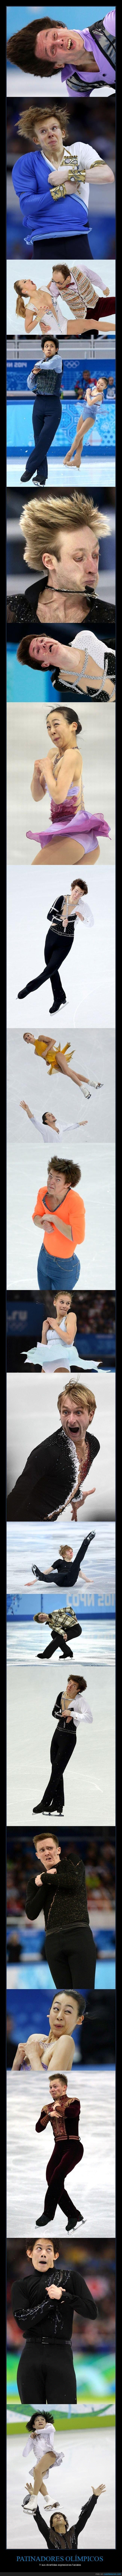 caras,patinadores